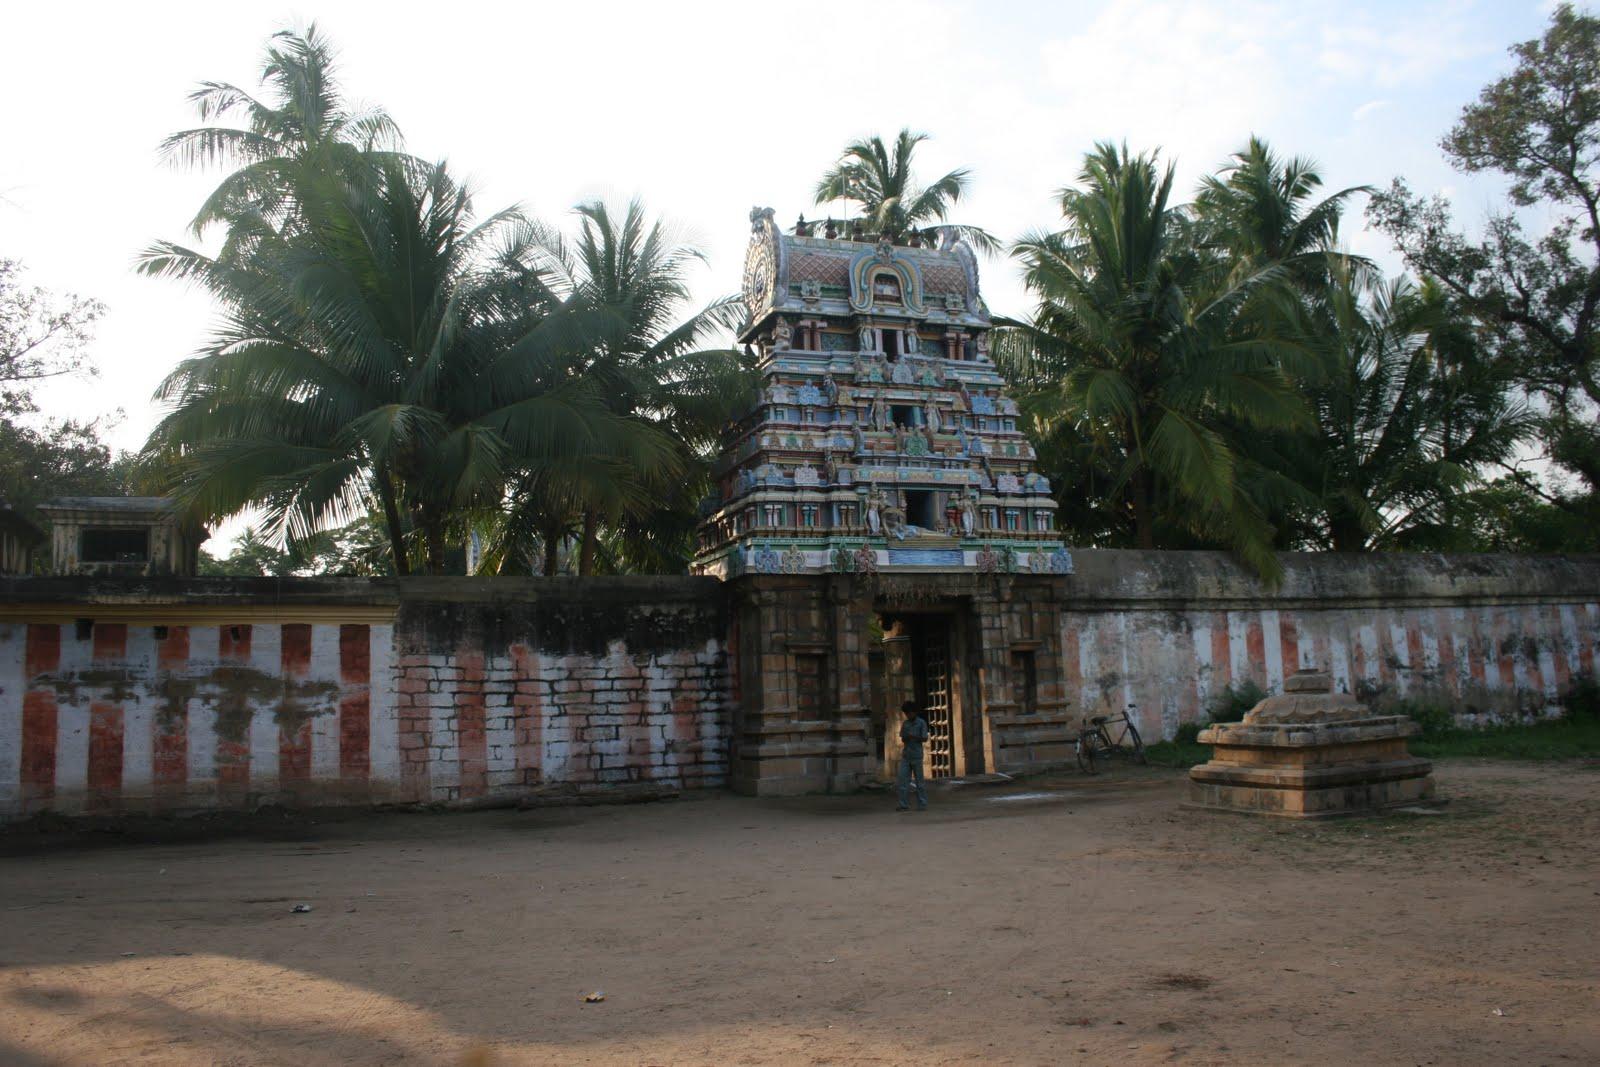 Sri Vadivazhagiya Nambi Perumal or Sundararaja Perumal Temple (Thiru Anbil), Trichy - Divya Desam 05